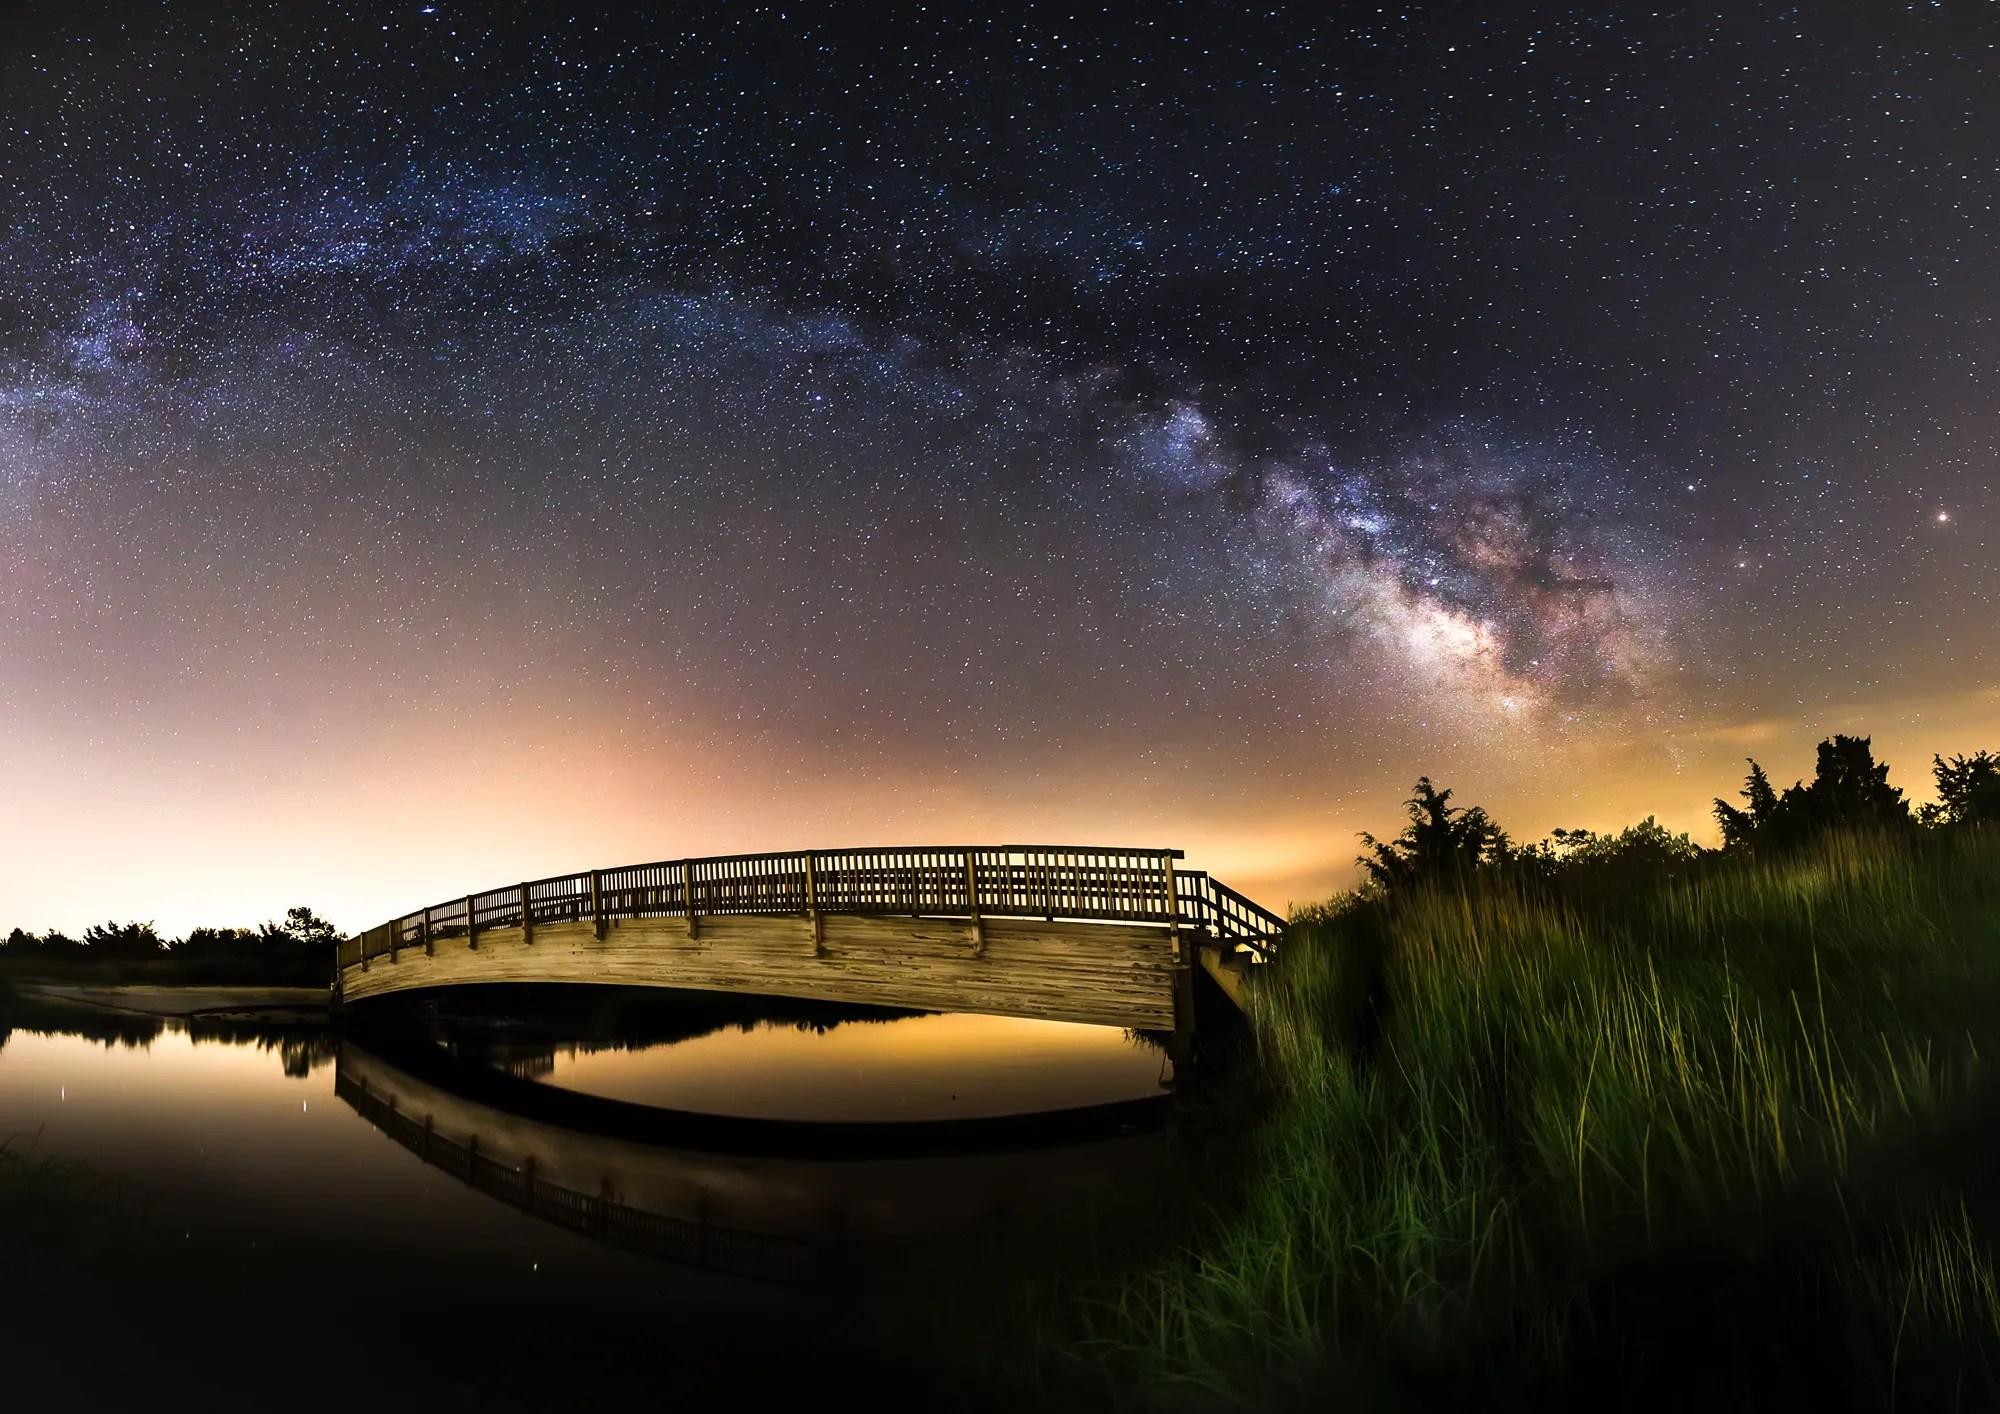 Milky Way spanning over a bridge